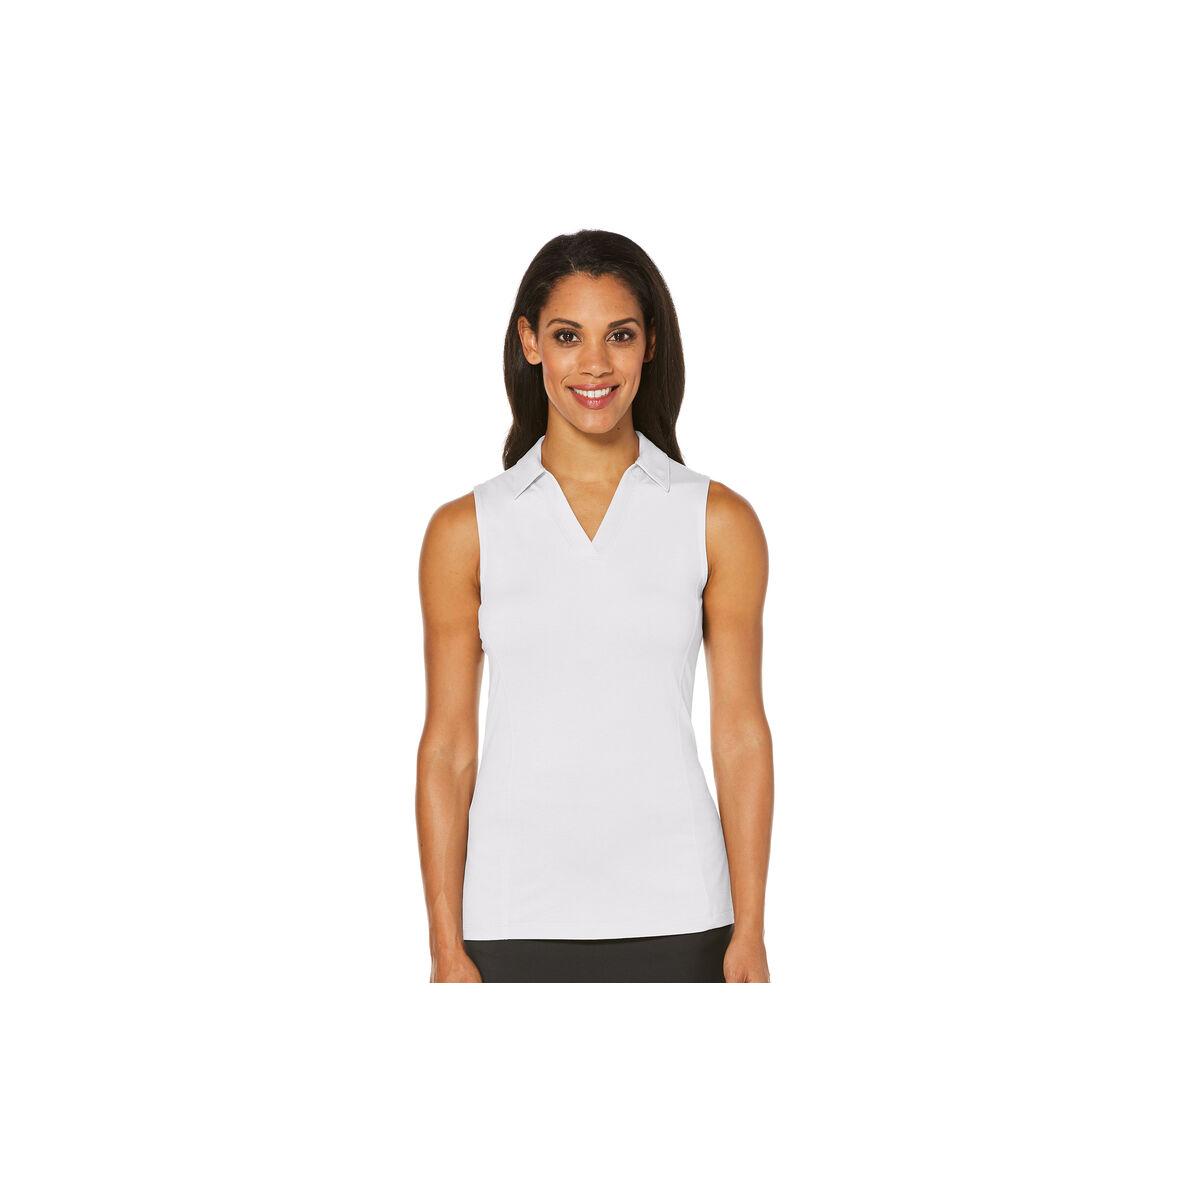 Women's Sleeveless AirFlux Breathable Polo, White, swatch